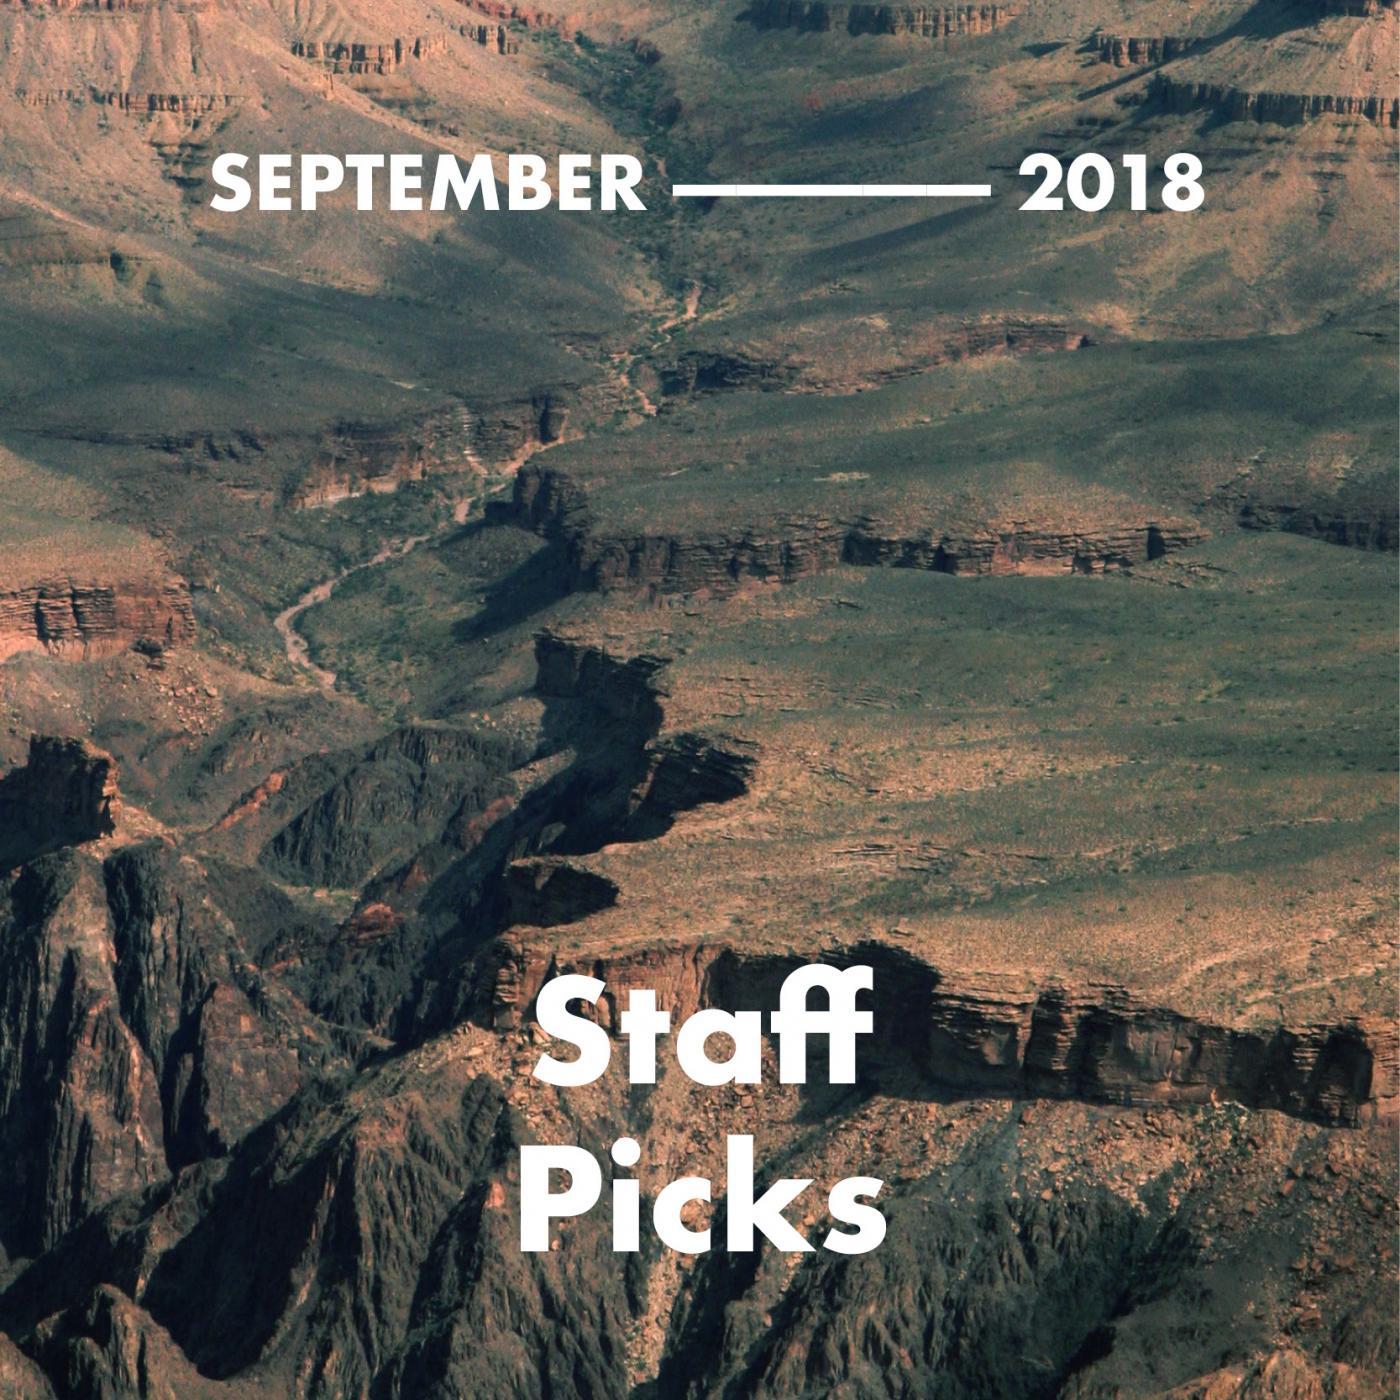 Staff Picks Playlist by The Venue Report